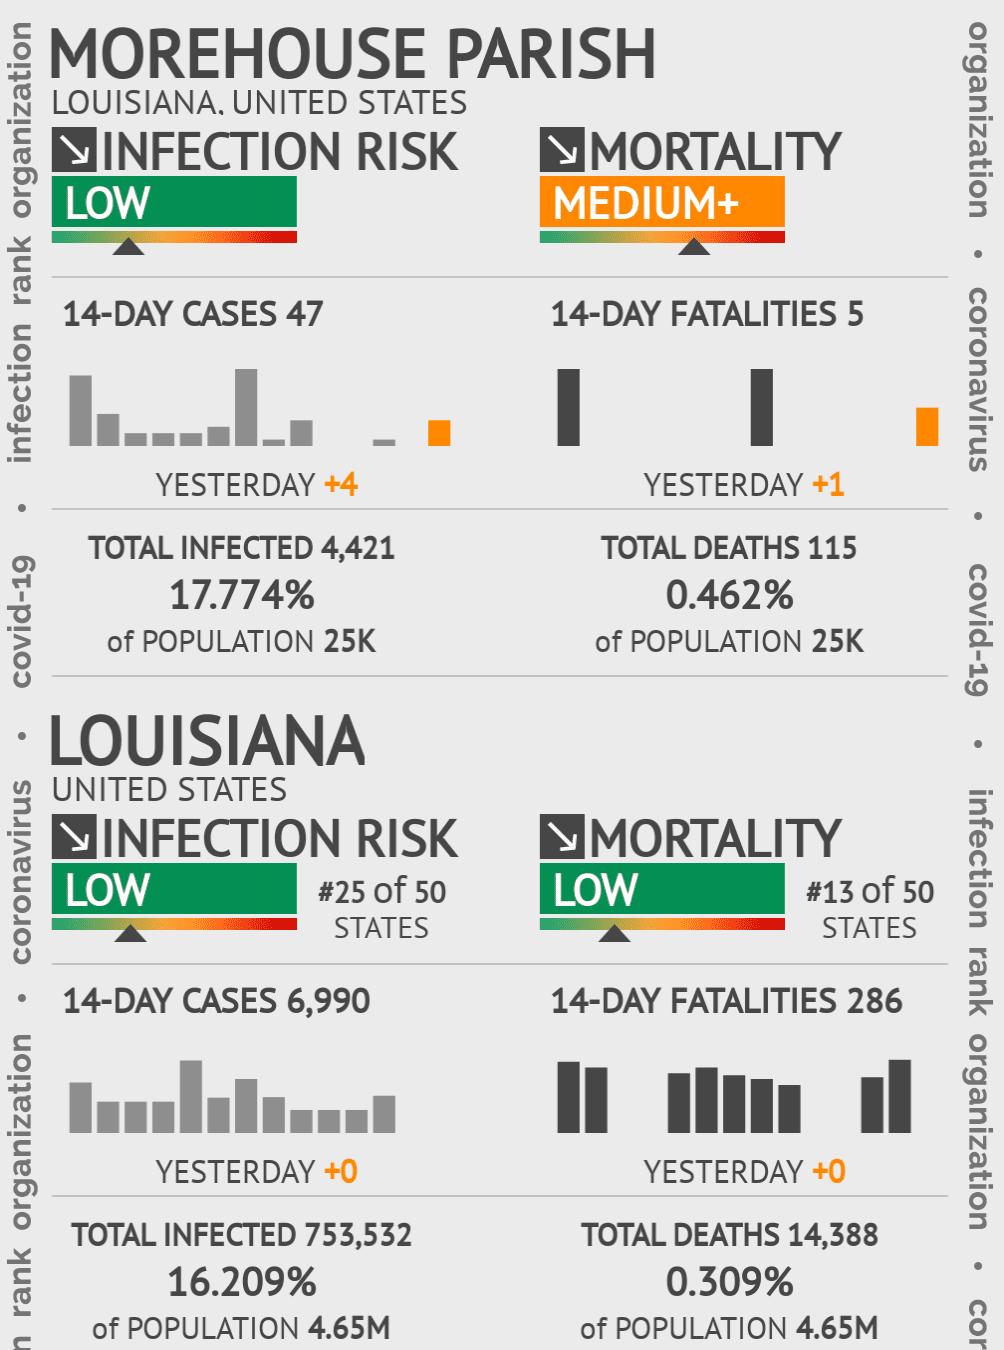 Morehouse Parish Coronavirus Covid-19 Risk of Infection on February 24, 2021